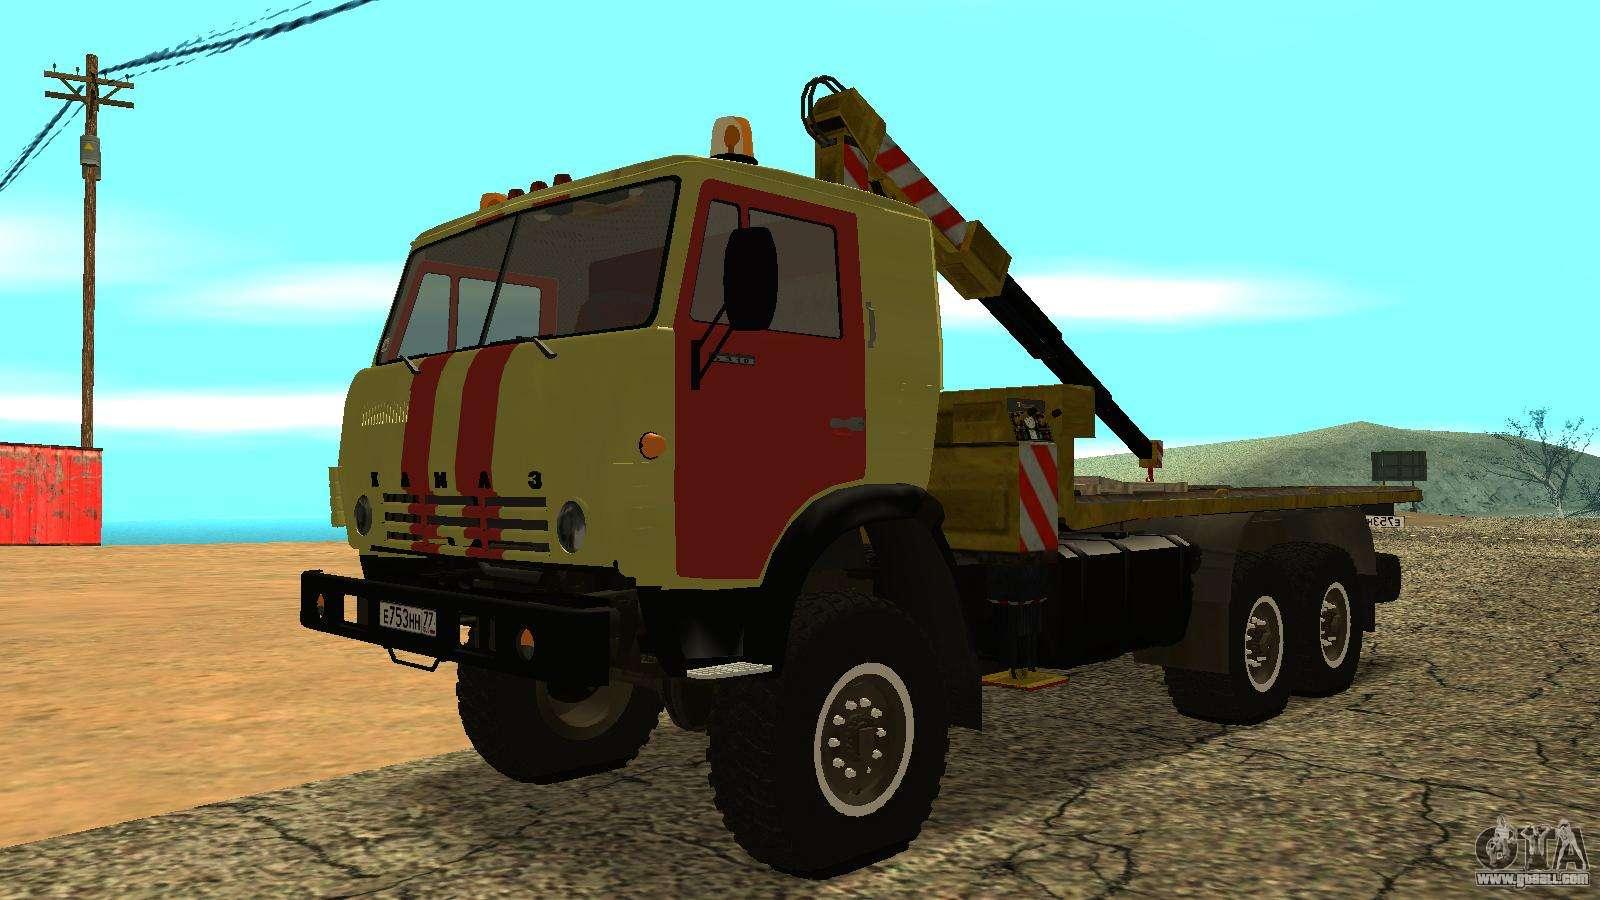 Tow Truck: Xbox 360 Gta 5 Tow Truck